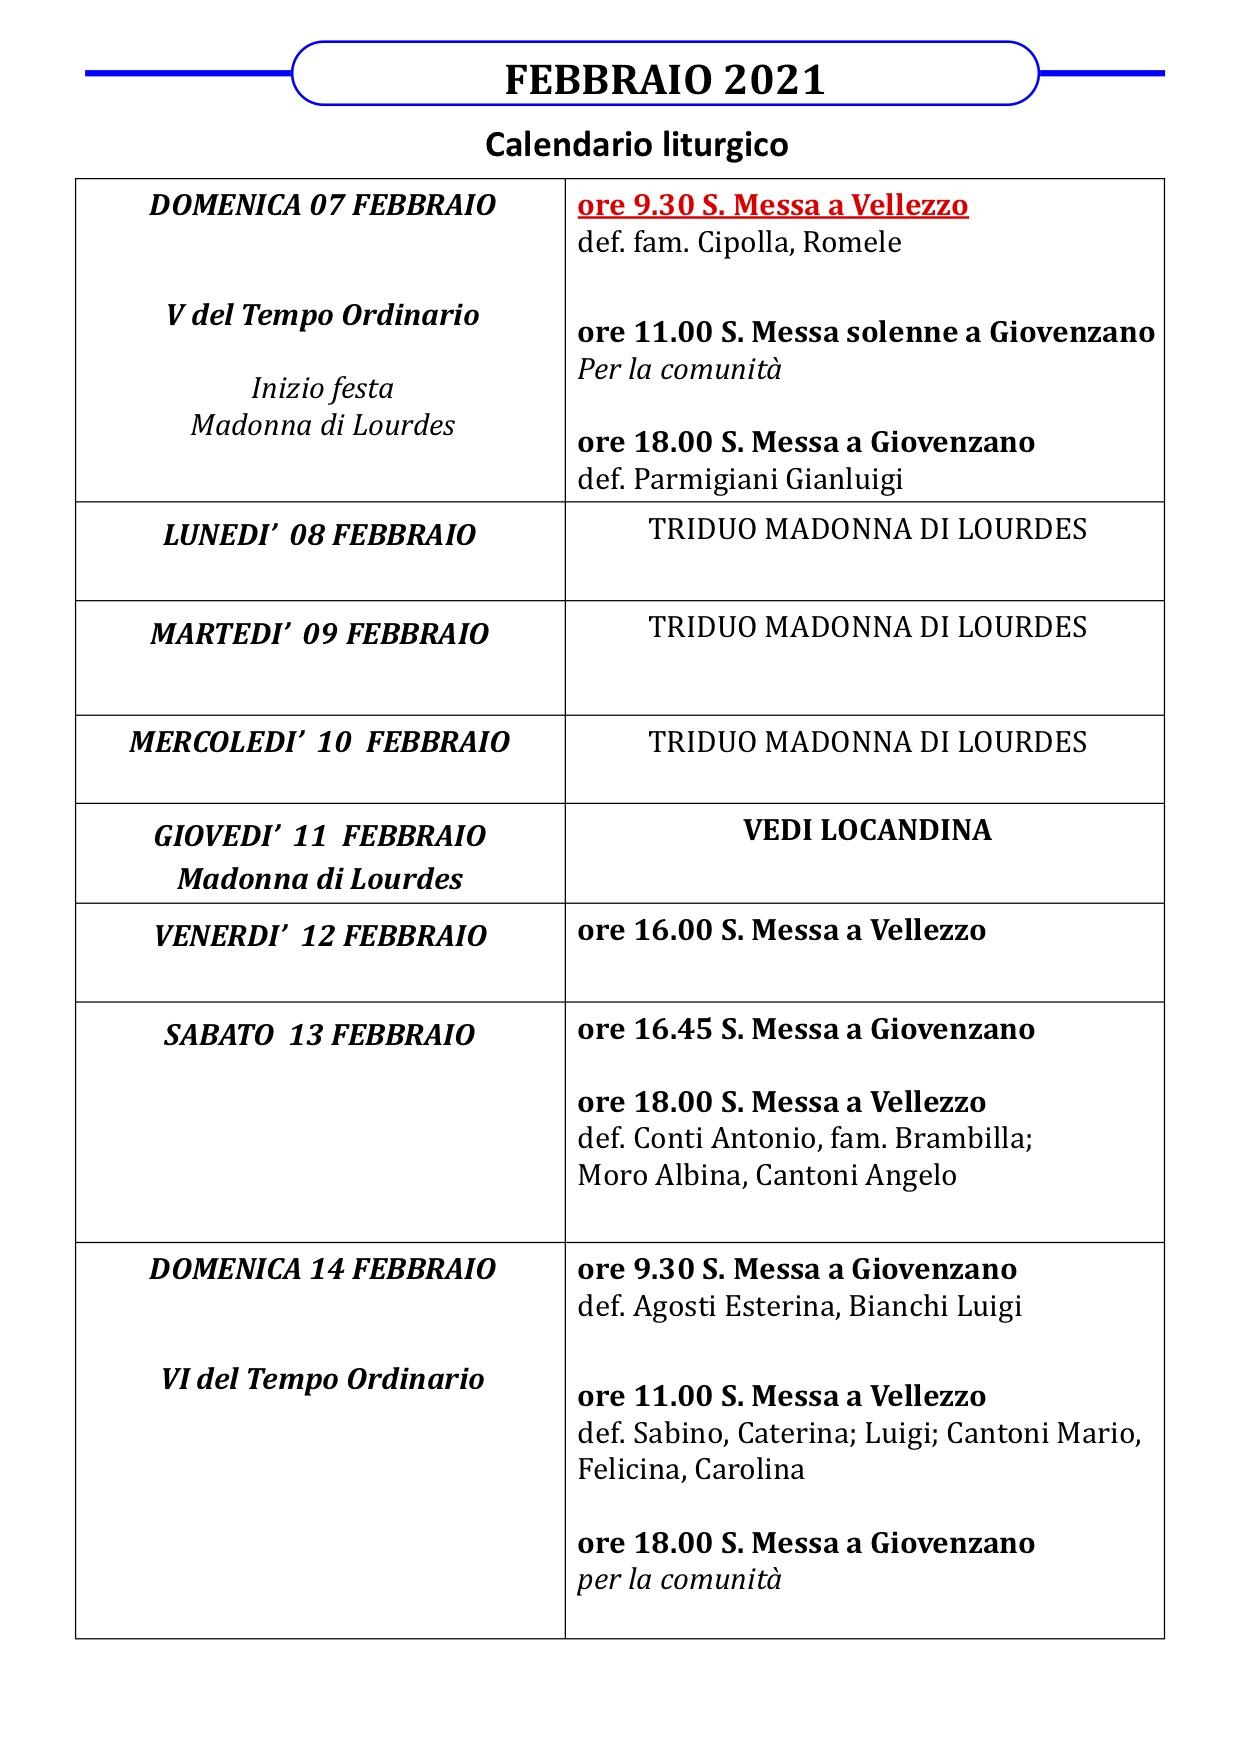 Calendario liturgico dal 07 febbraio al 14 febbraio 2021